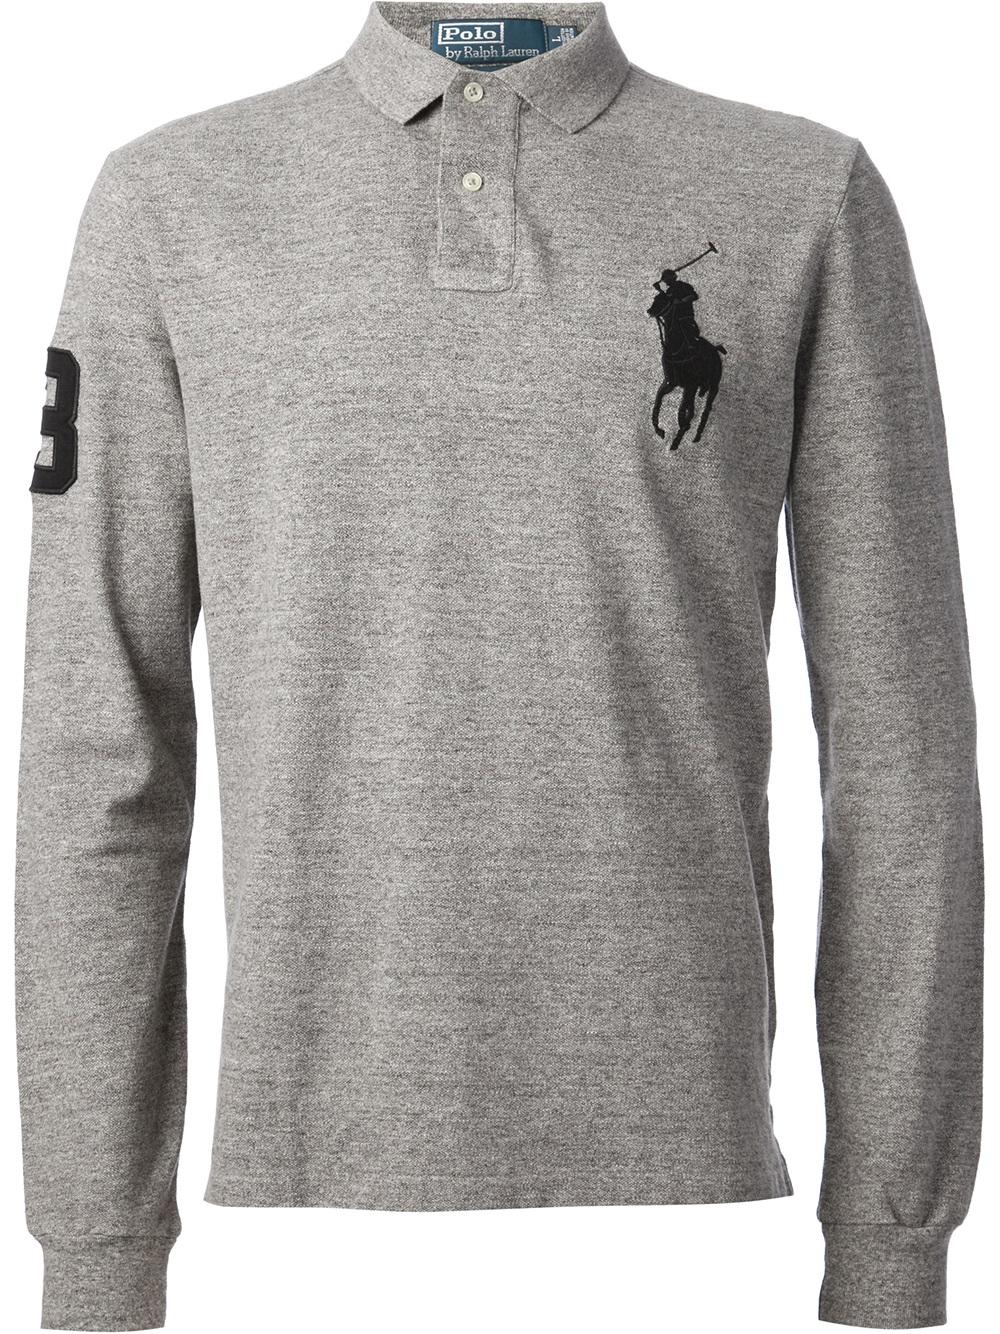 Cheap Designer Long Sleeve Polo Shirts